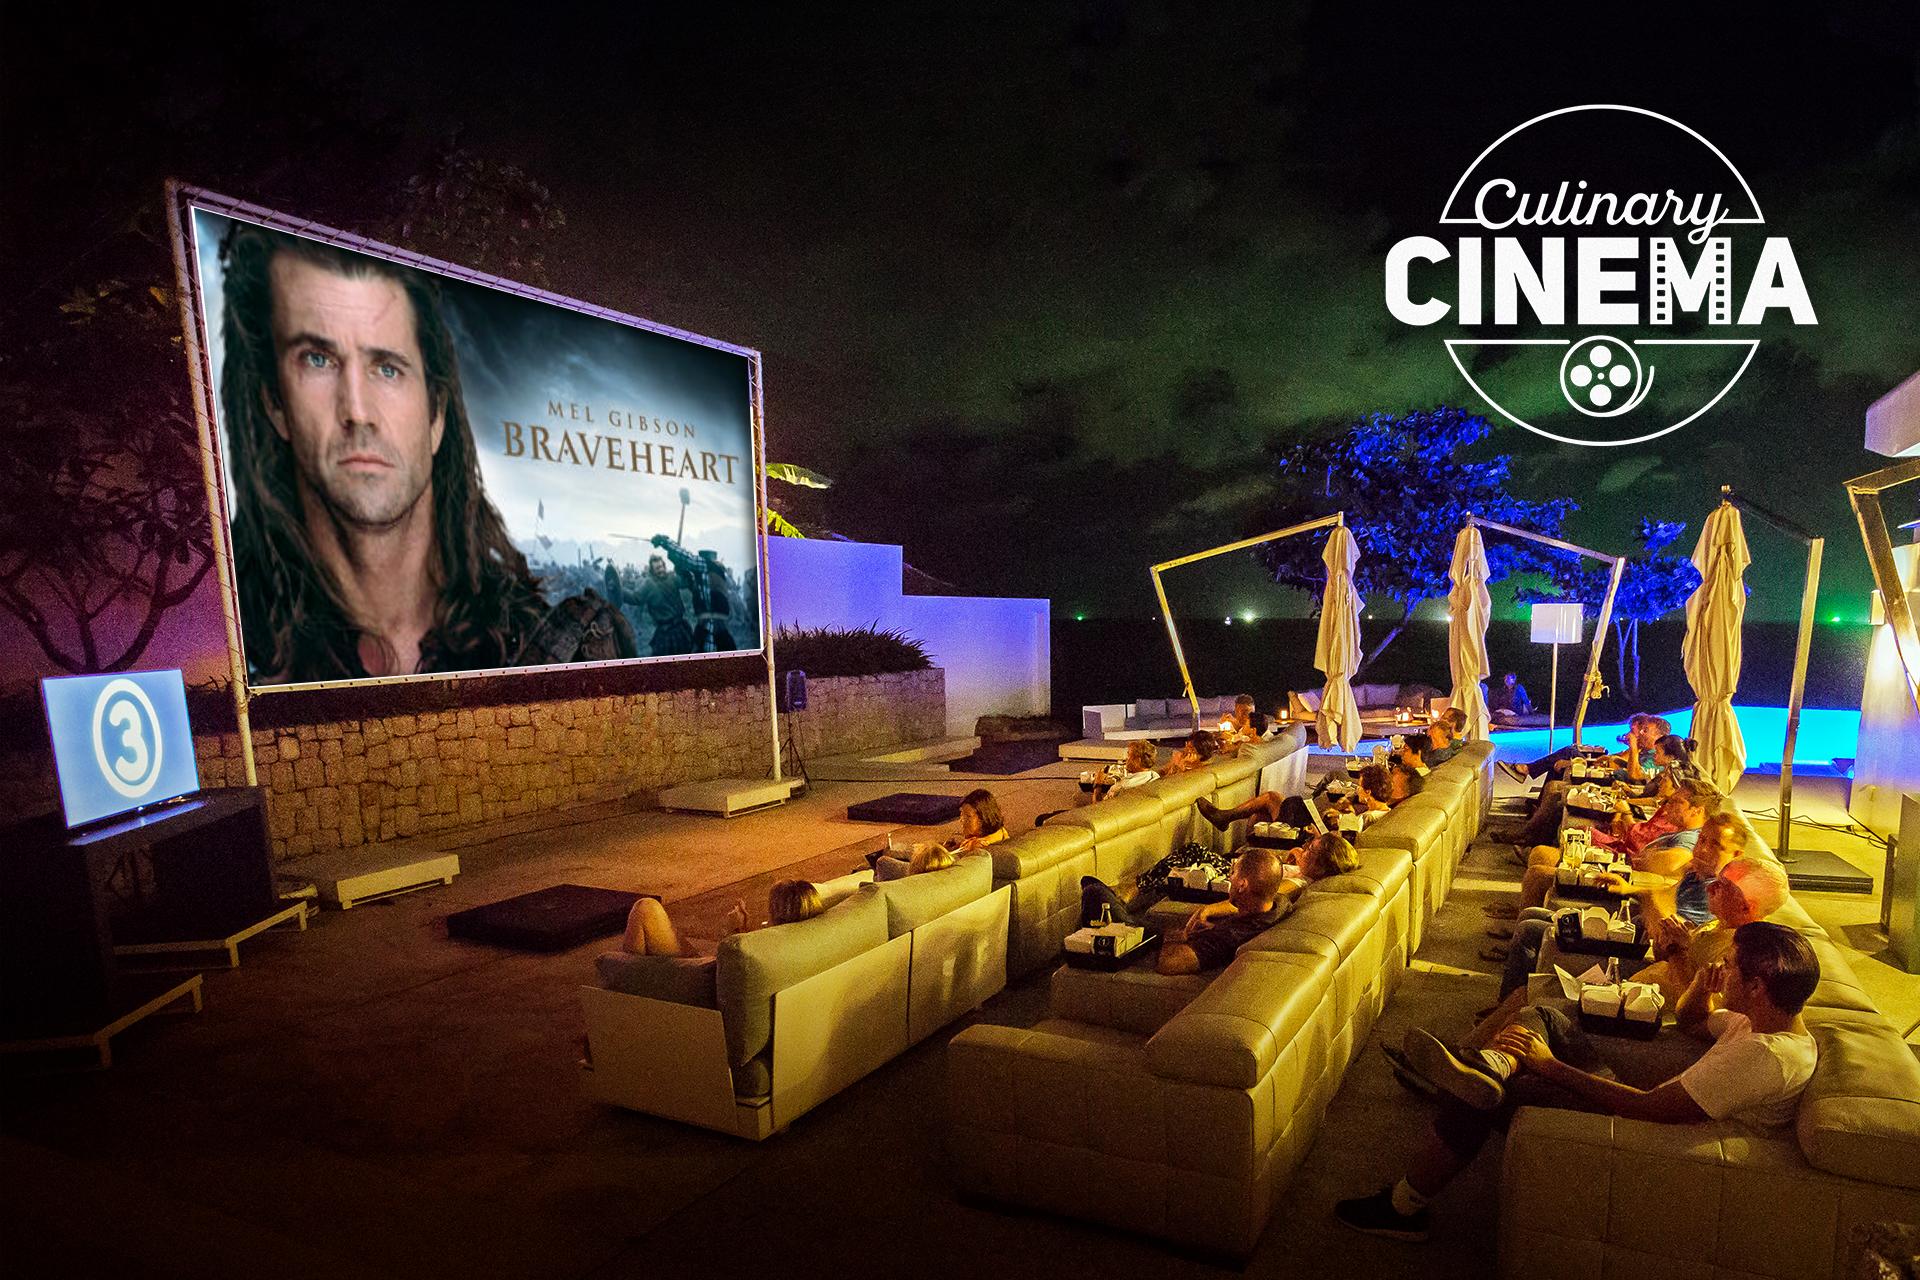 26 JANUARY CULINARY CINEMA - BRAVEHEART